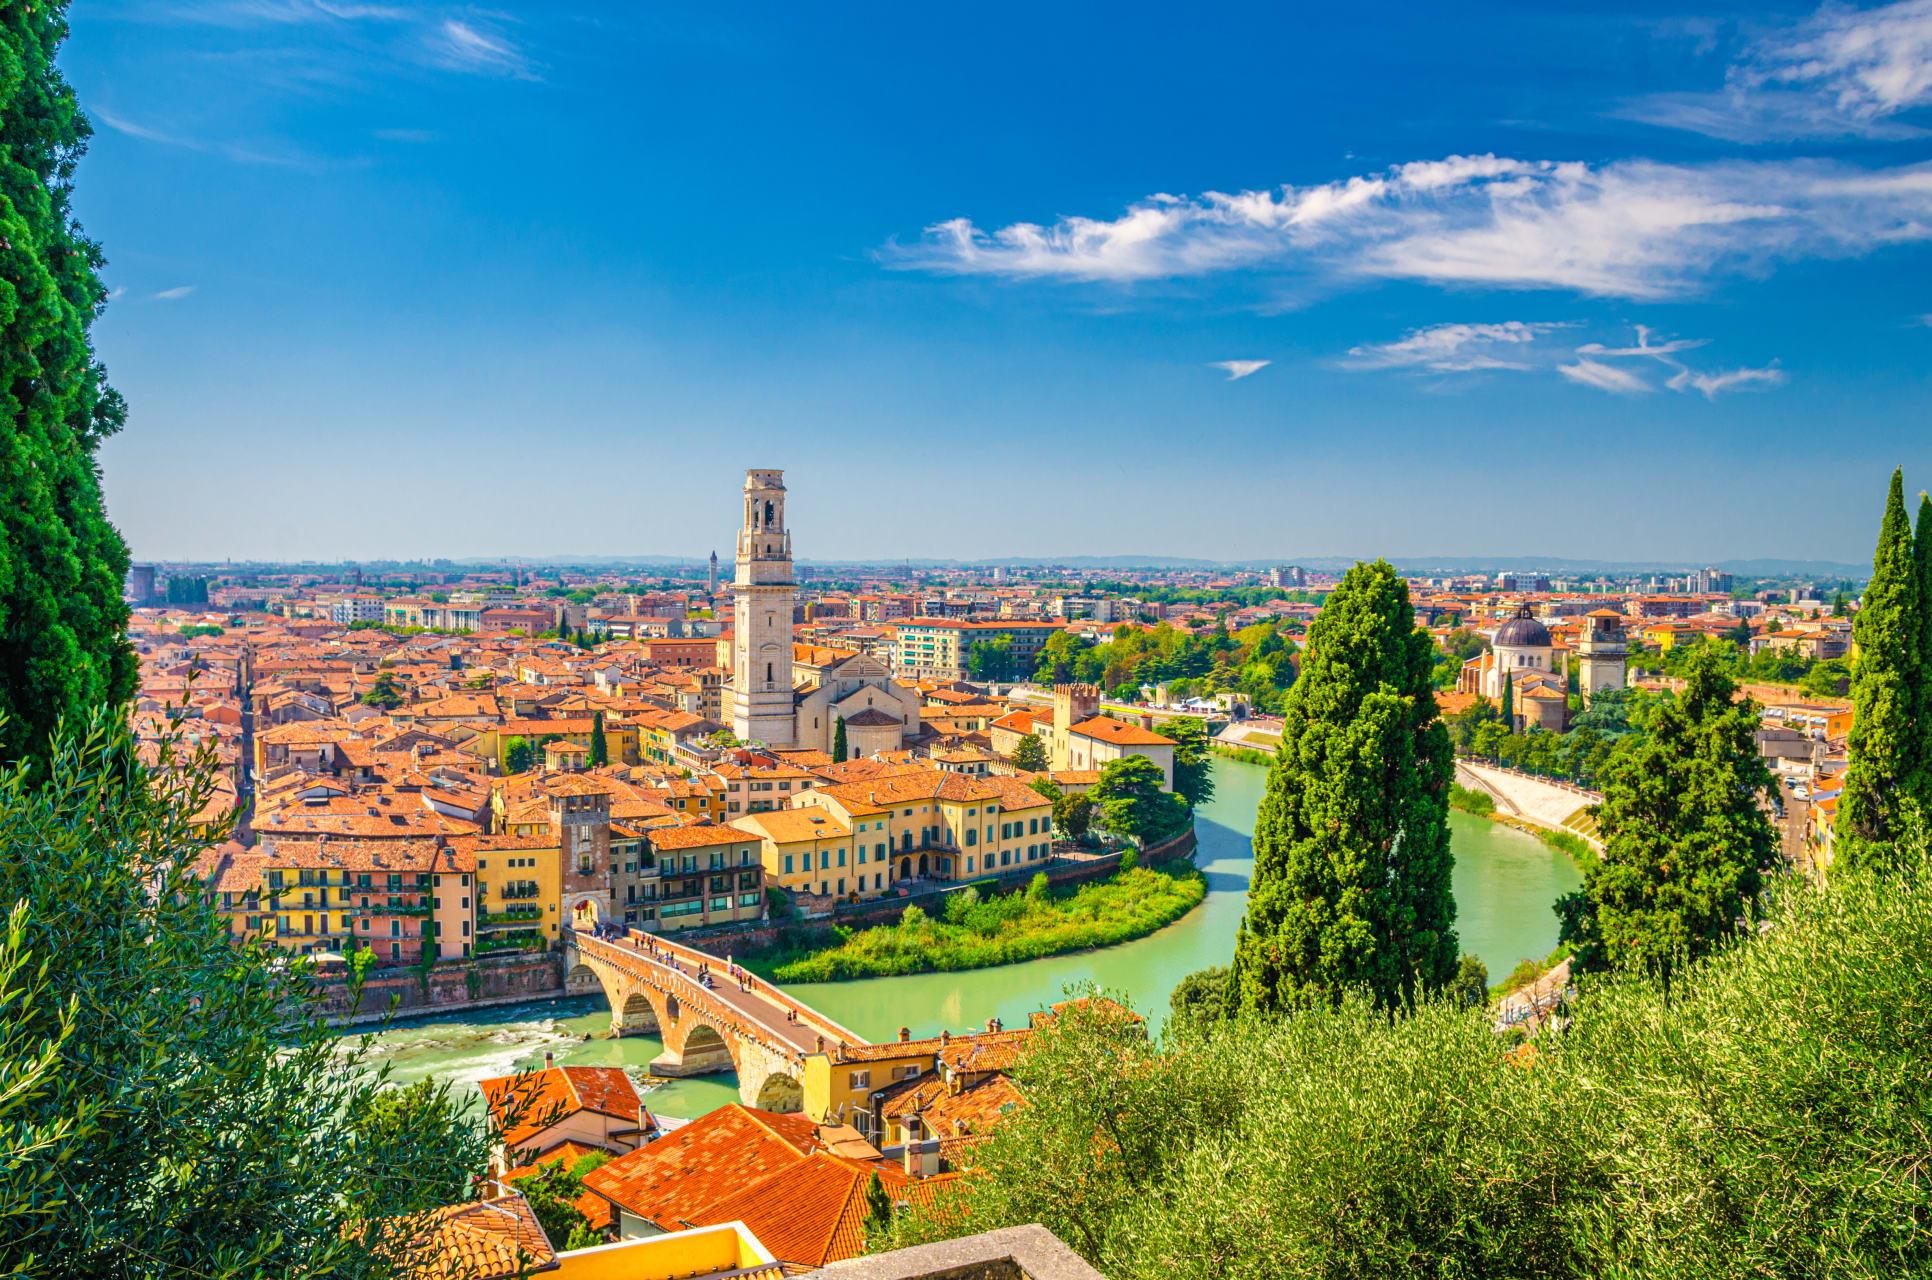 Veneto - Verona the city of Romeo and Juliet